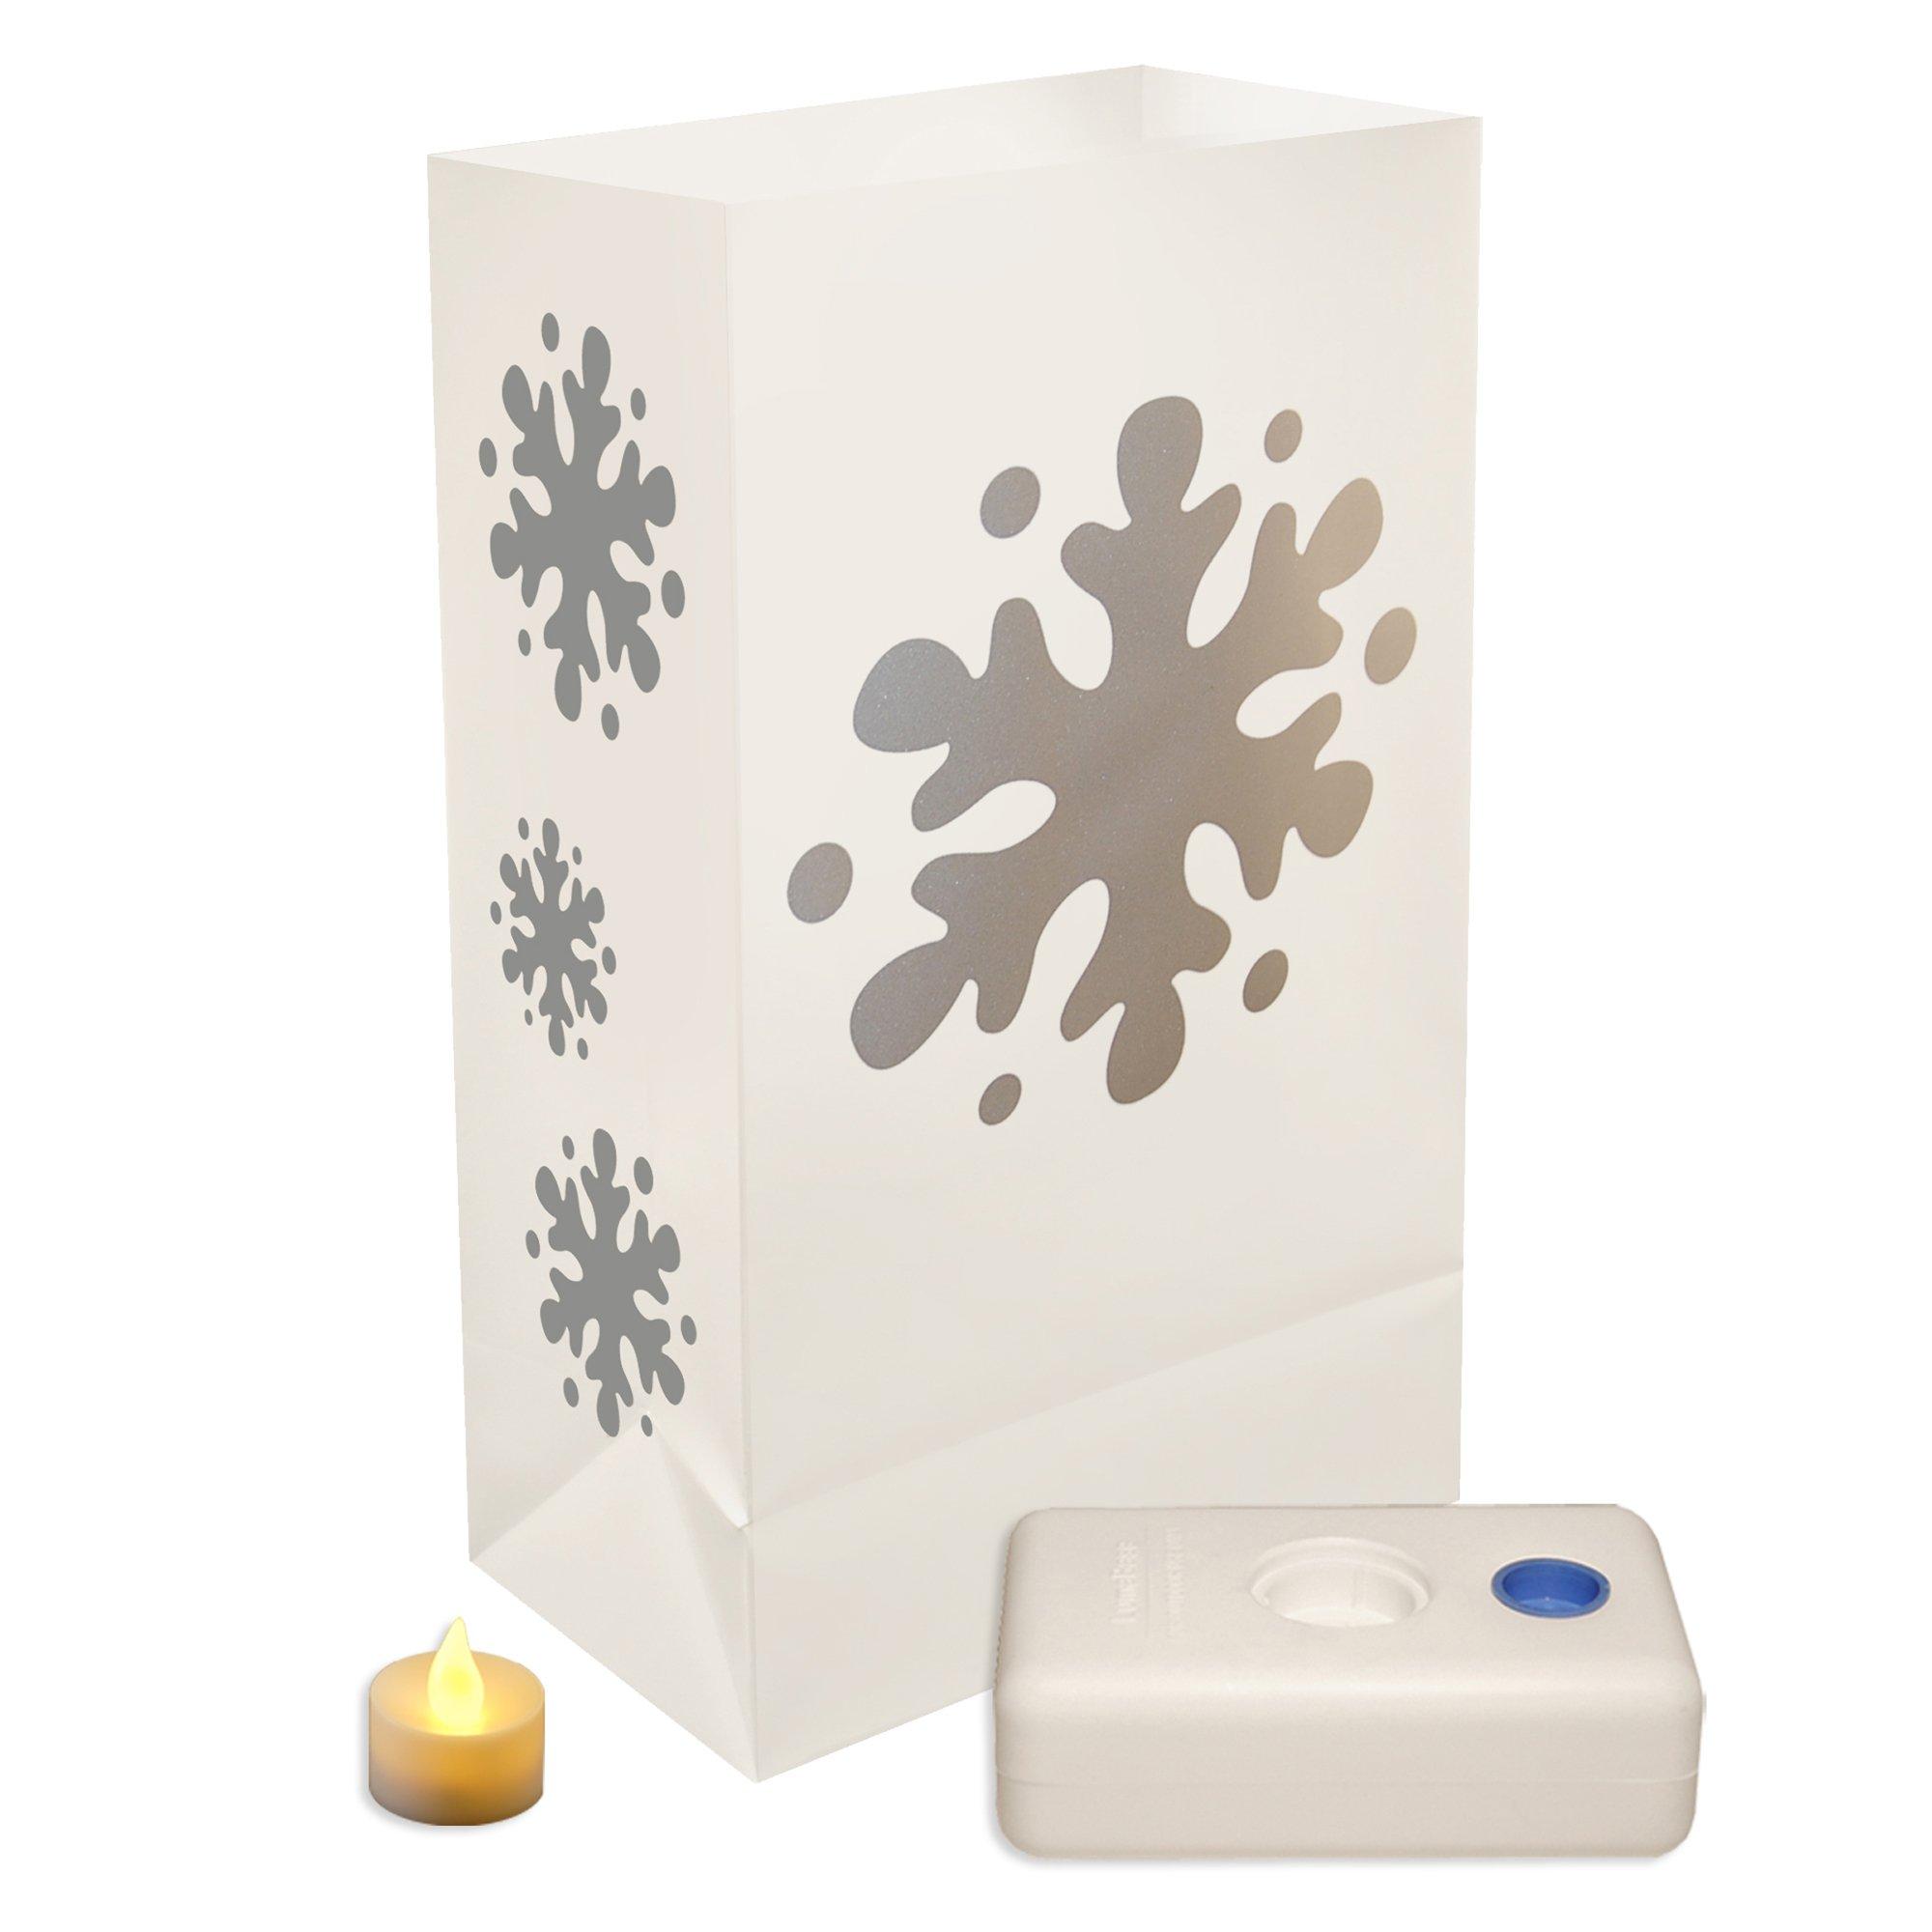 Lumabase 82236 12 Count Snowflake Battery Operated Luminaria Kit by Lumabase